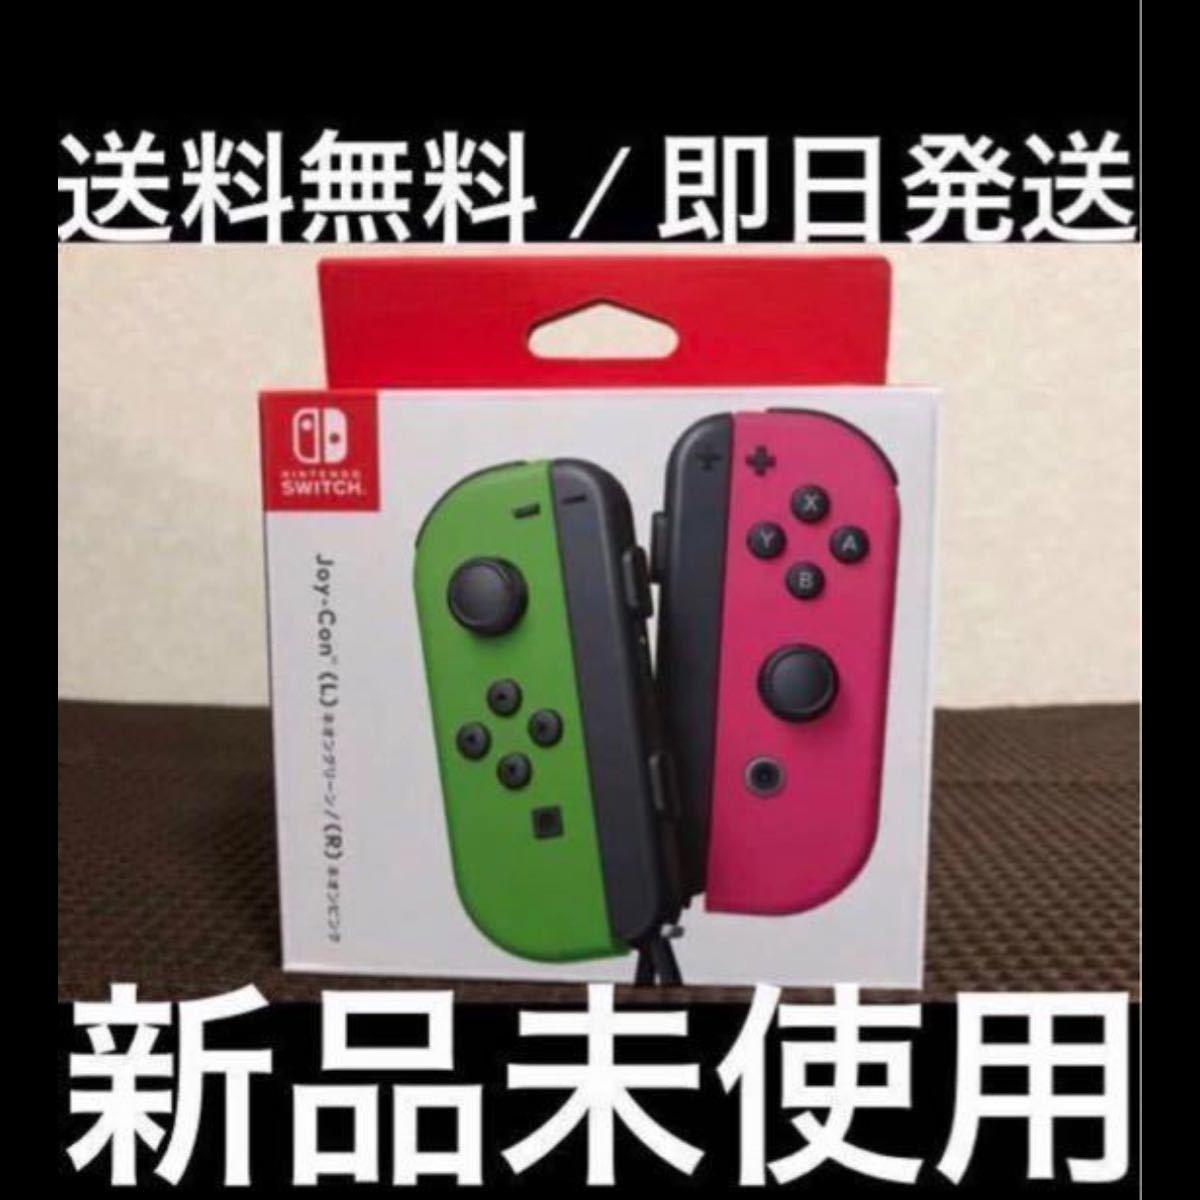 Switch Joy-Con(L)ネオングリーン/(R)ネオンピンク ジョイコンNintendo Switch